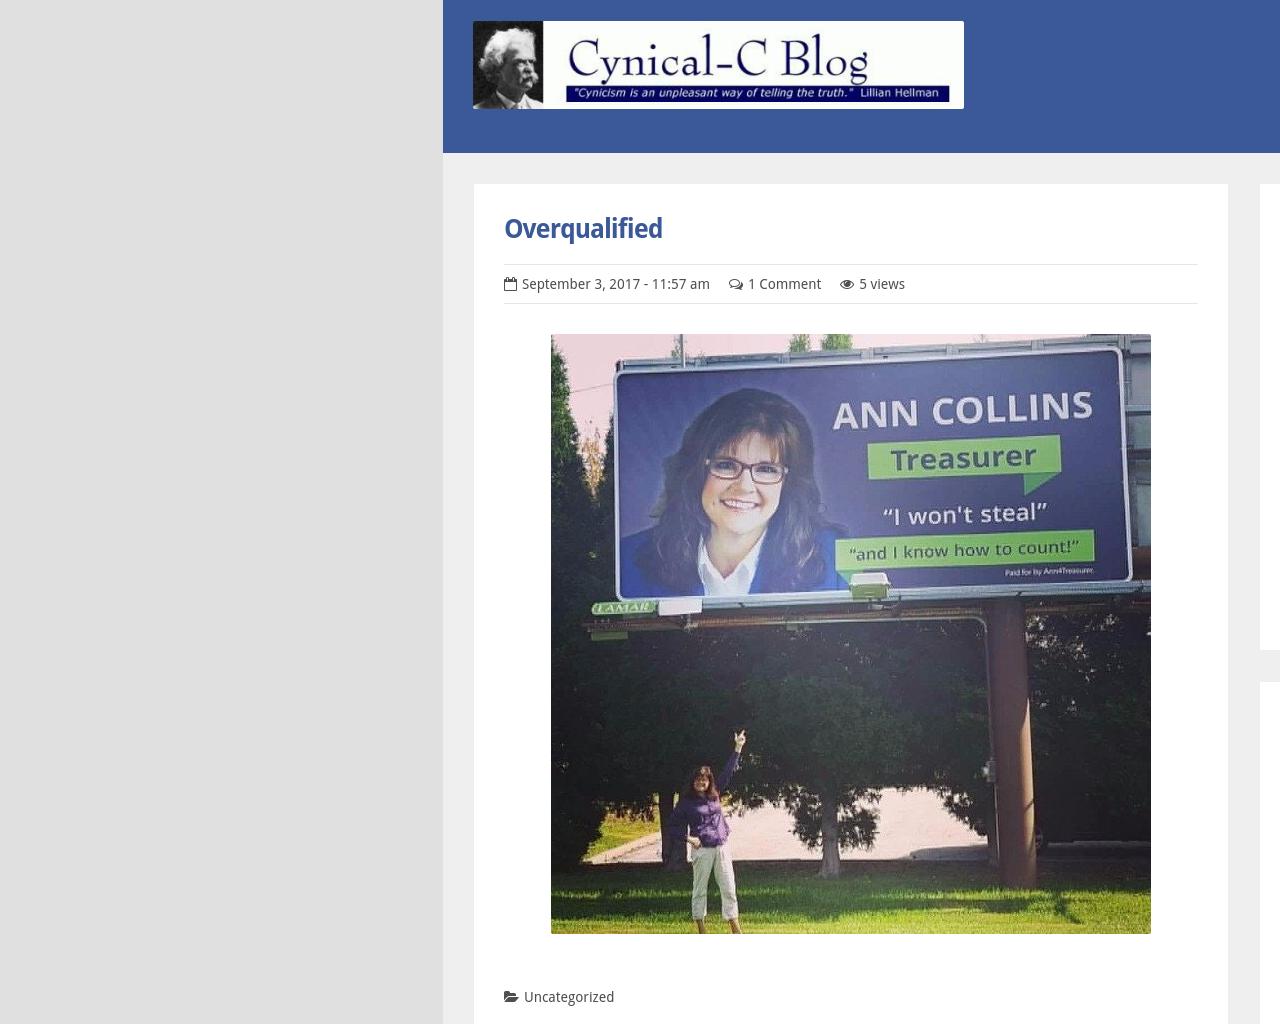 Cynical-C-Blog-Advertising-Reviews-Pricing